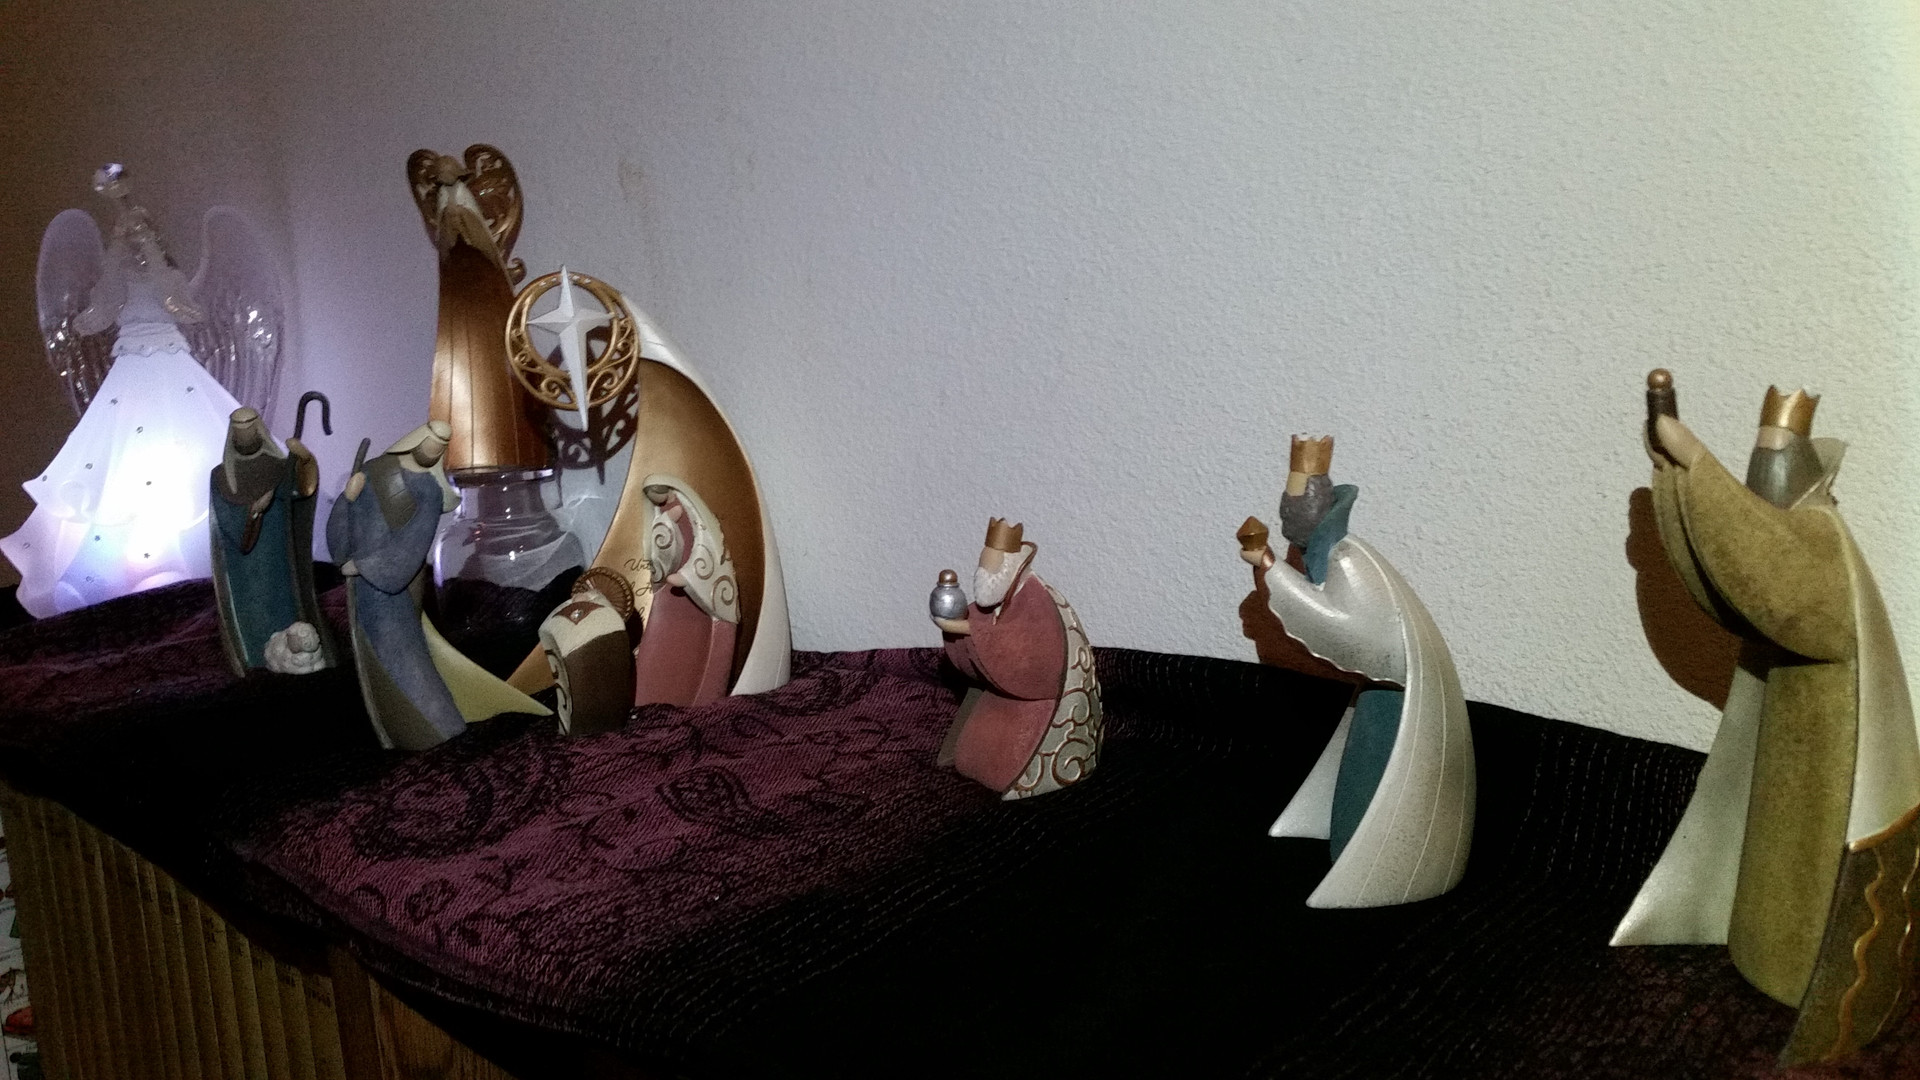 The Higginbothams: Contemporary Nativity (2011)